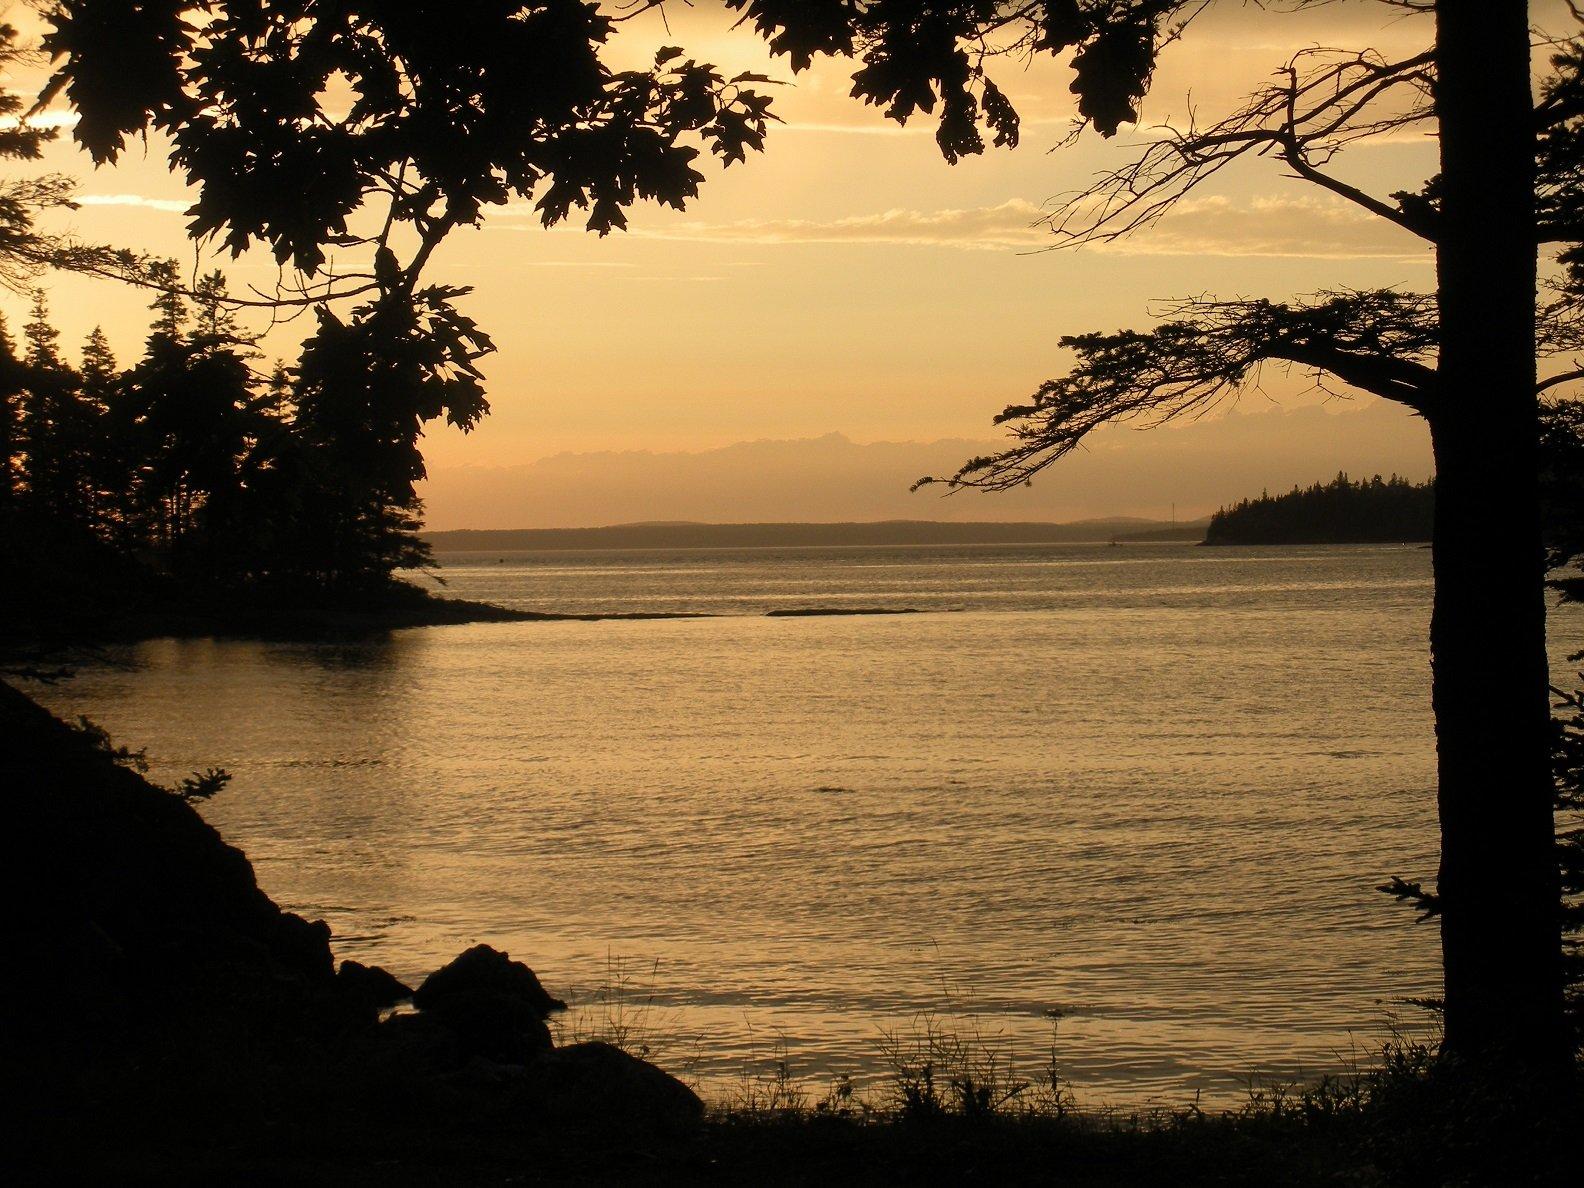 Penobscot Bay Sunset